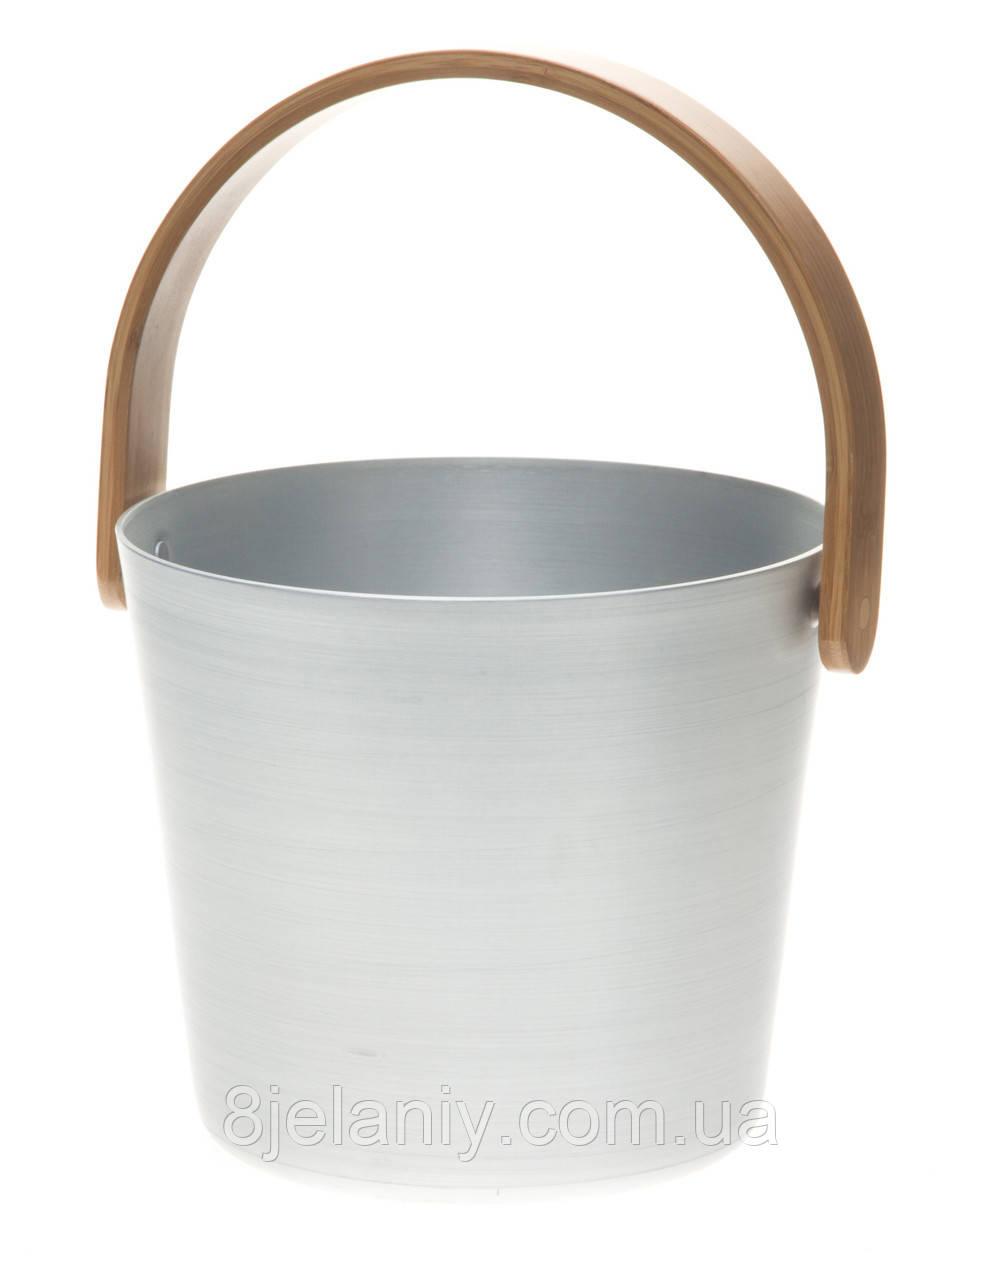 Ведро для сауны 5 л Rento алюминий серый 261307